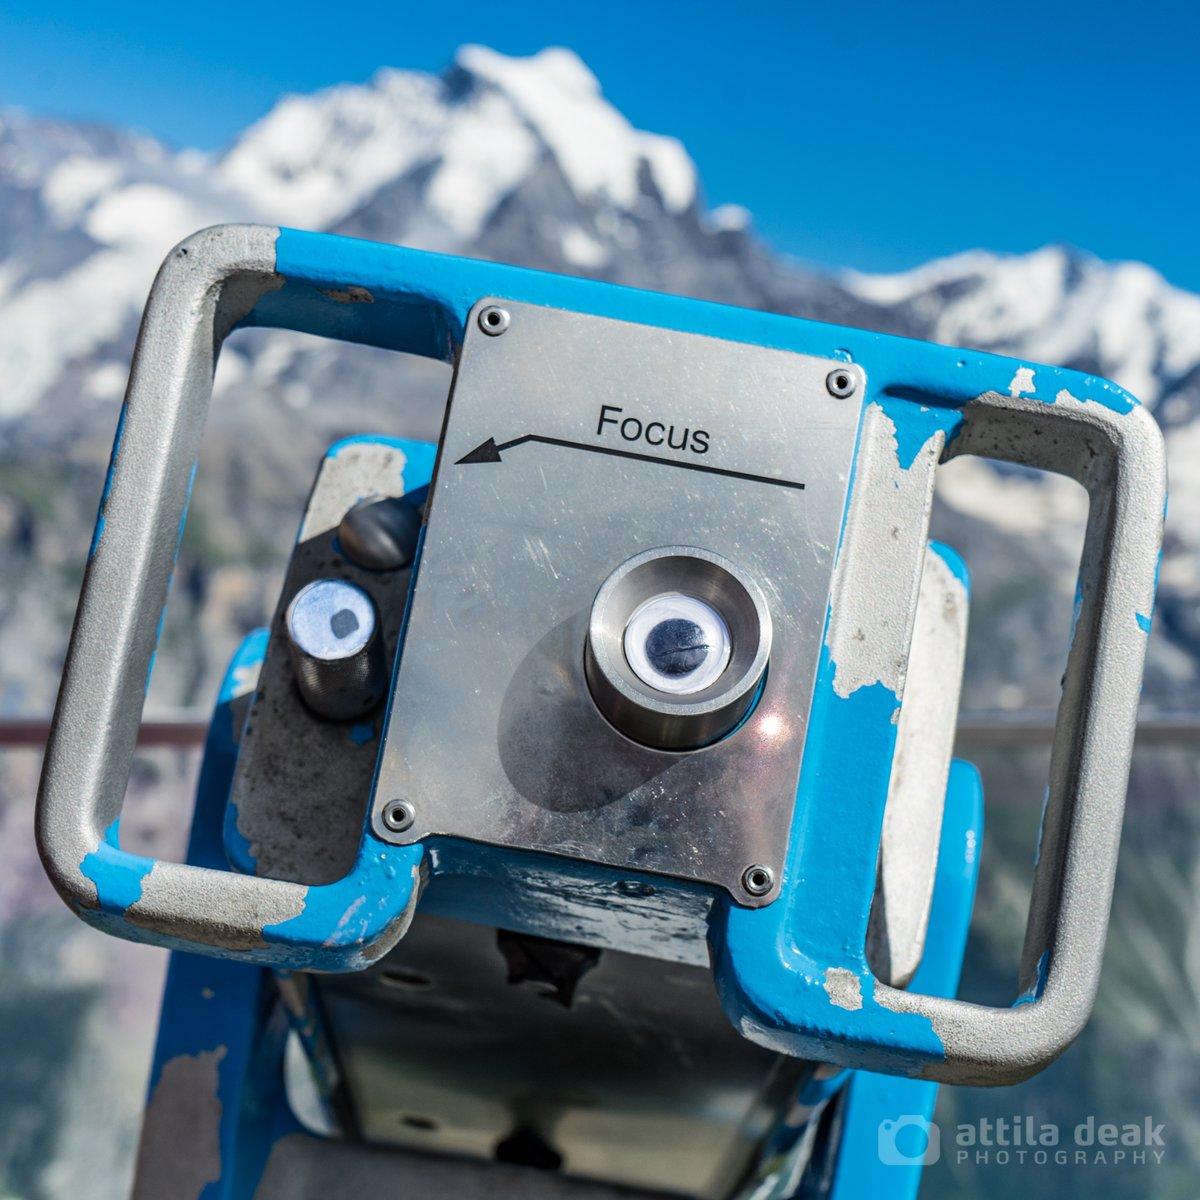 Hi, I'm Martin from Mürren, Switzerland. Every mountain top is within reach if you just keep climbing. #Mürren #eyescream #sharetravelpics pic.twitter.com/B5piridIq3